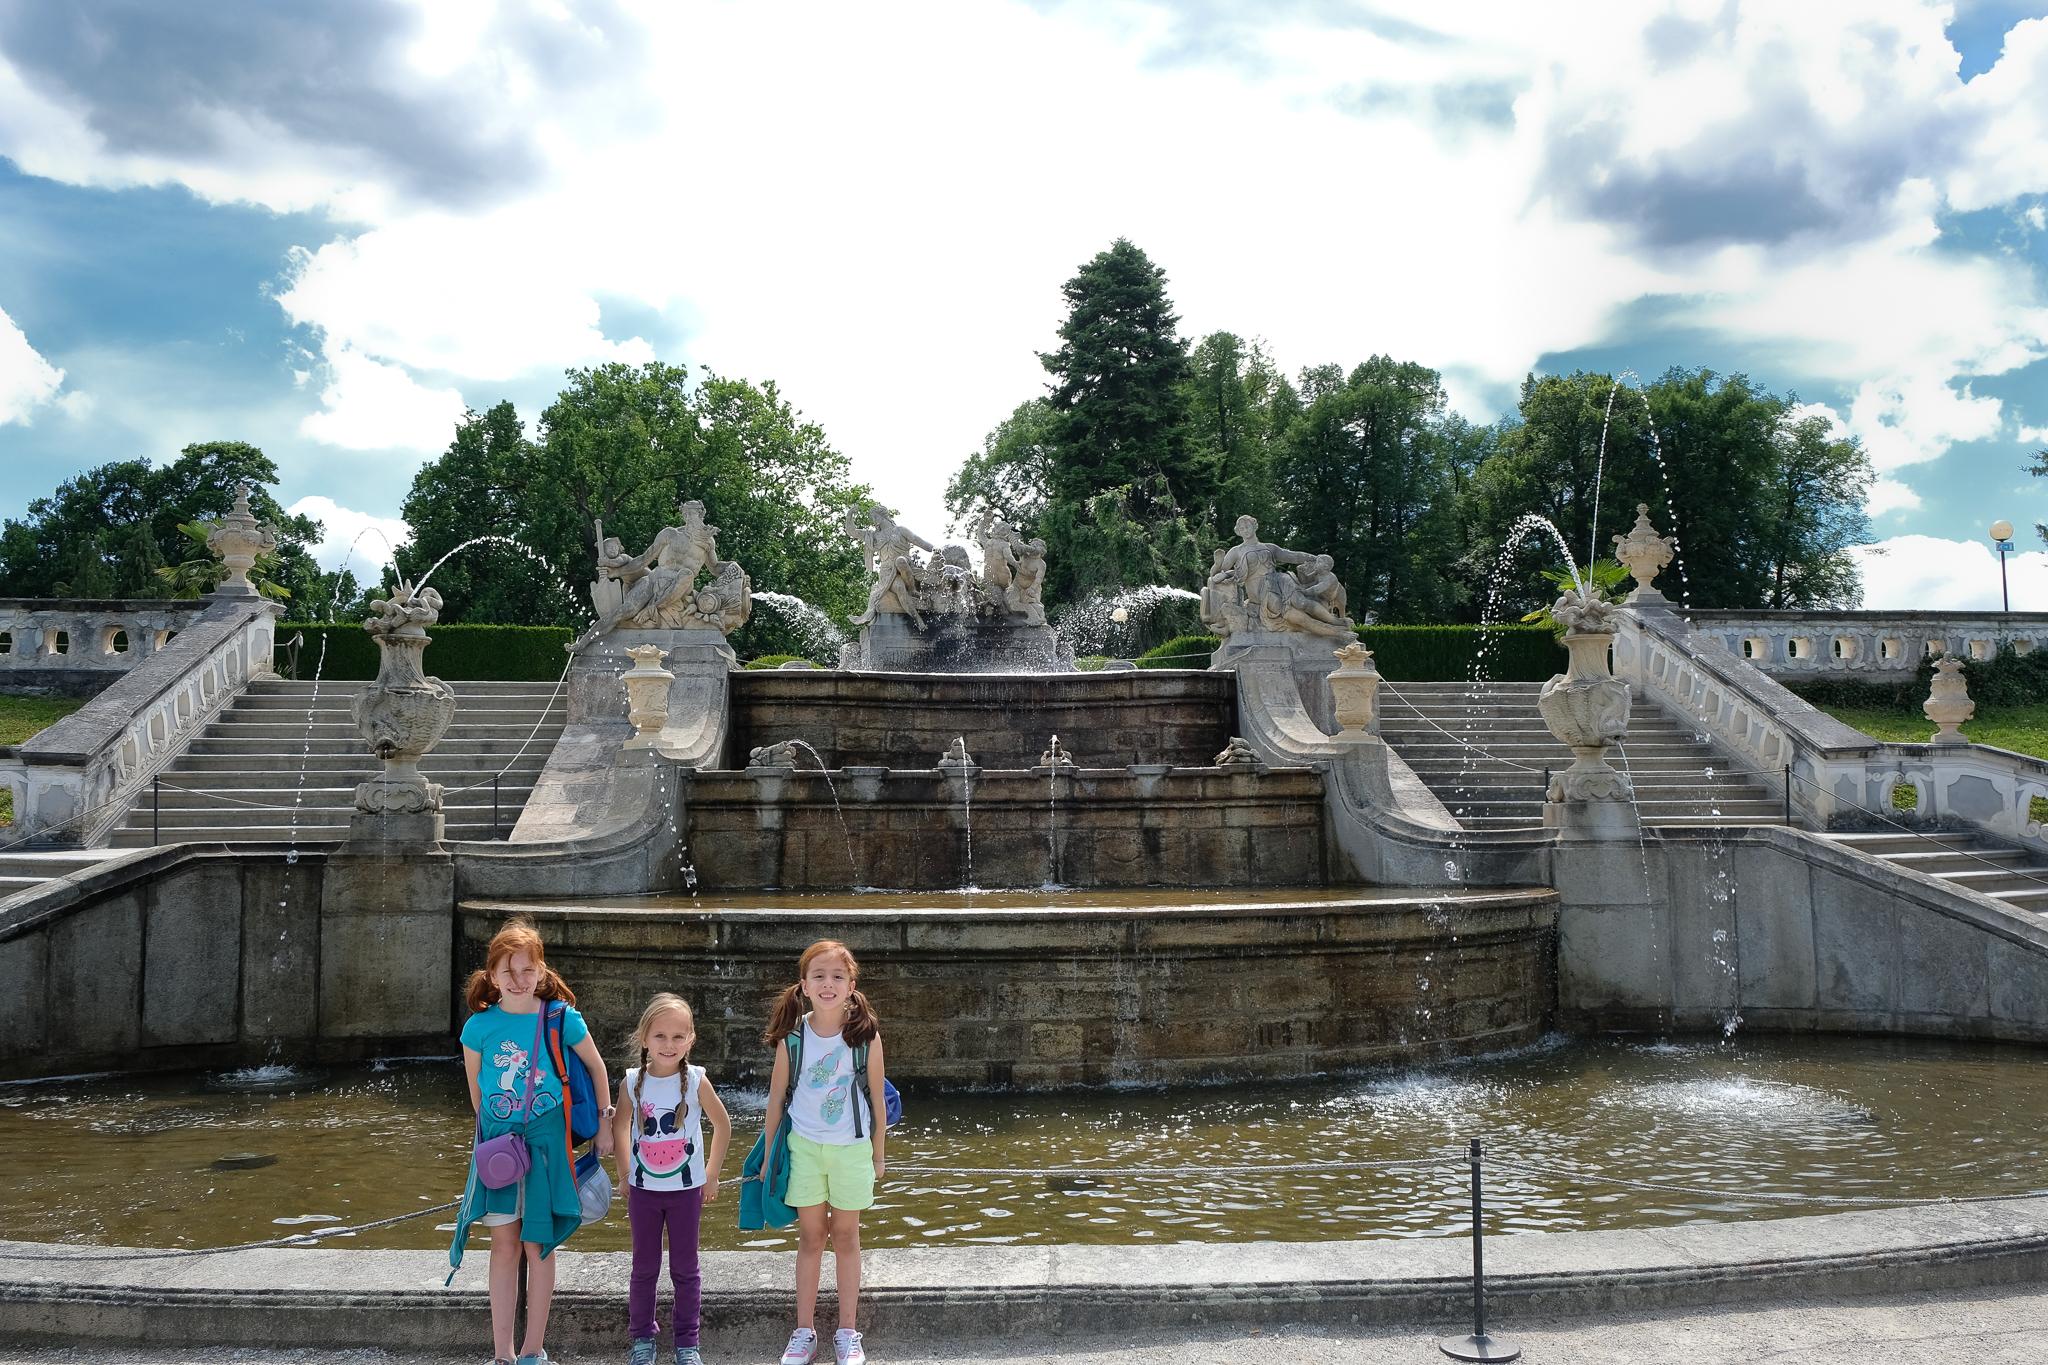 Royal Gardens Cesky Krumlov